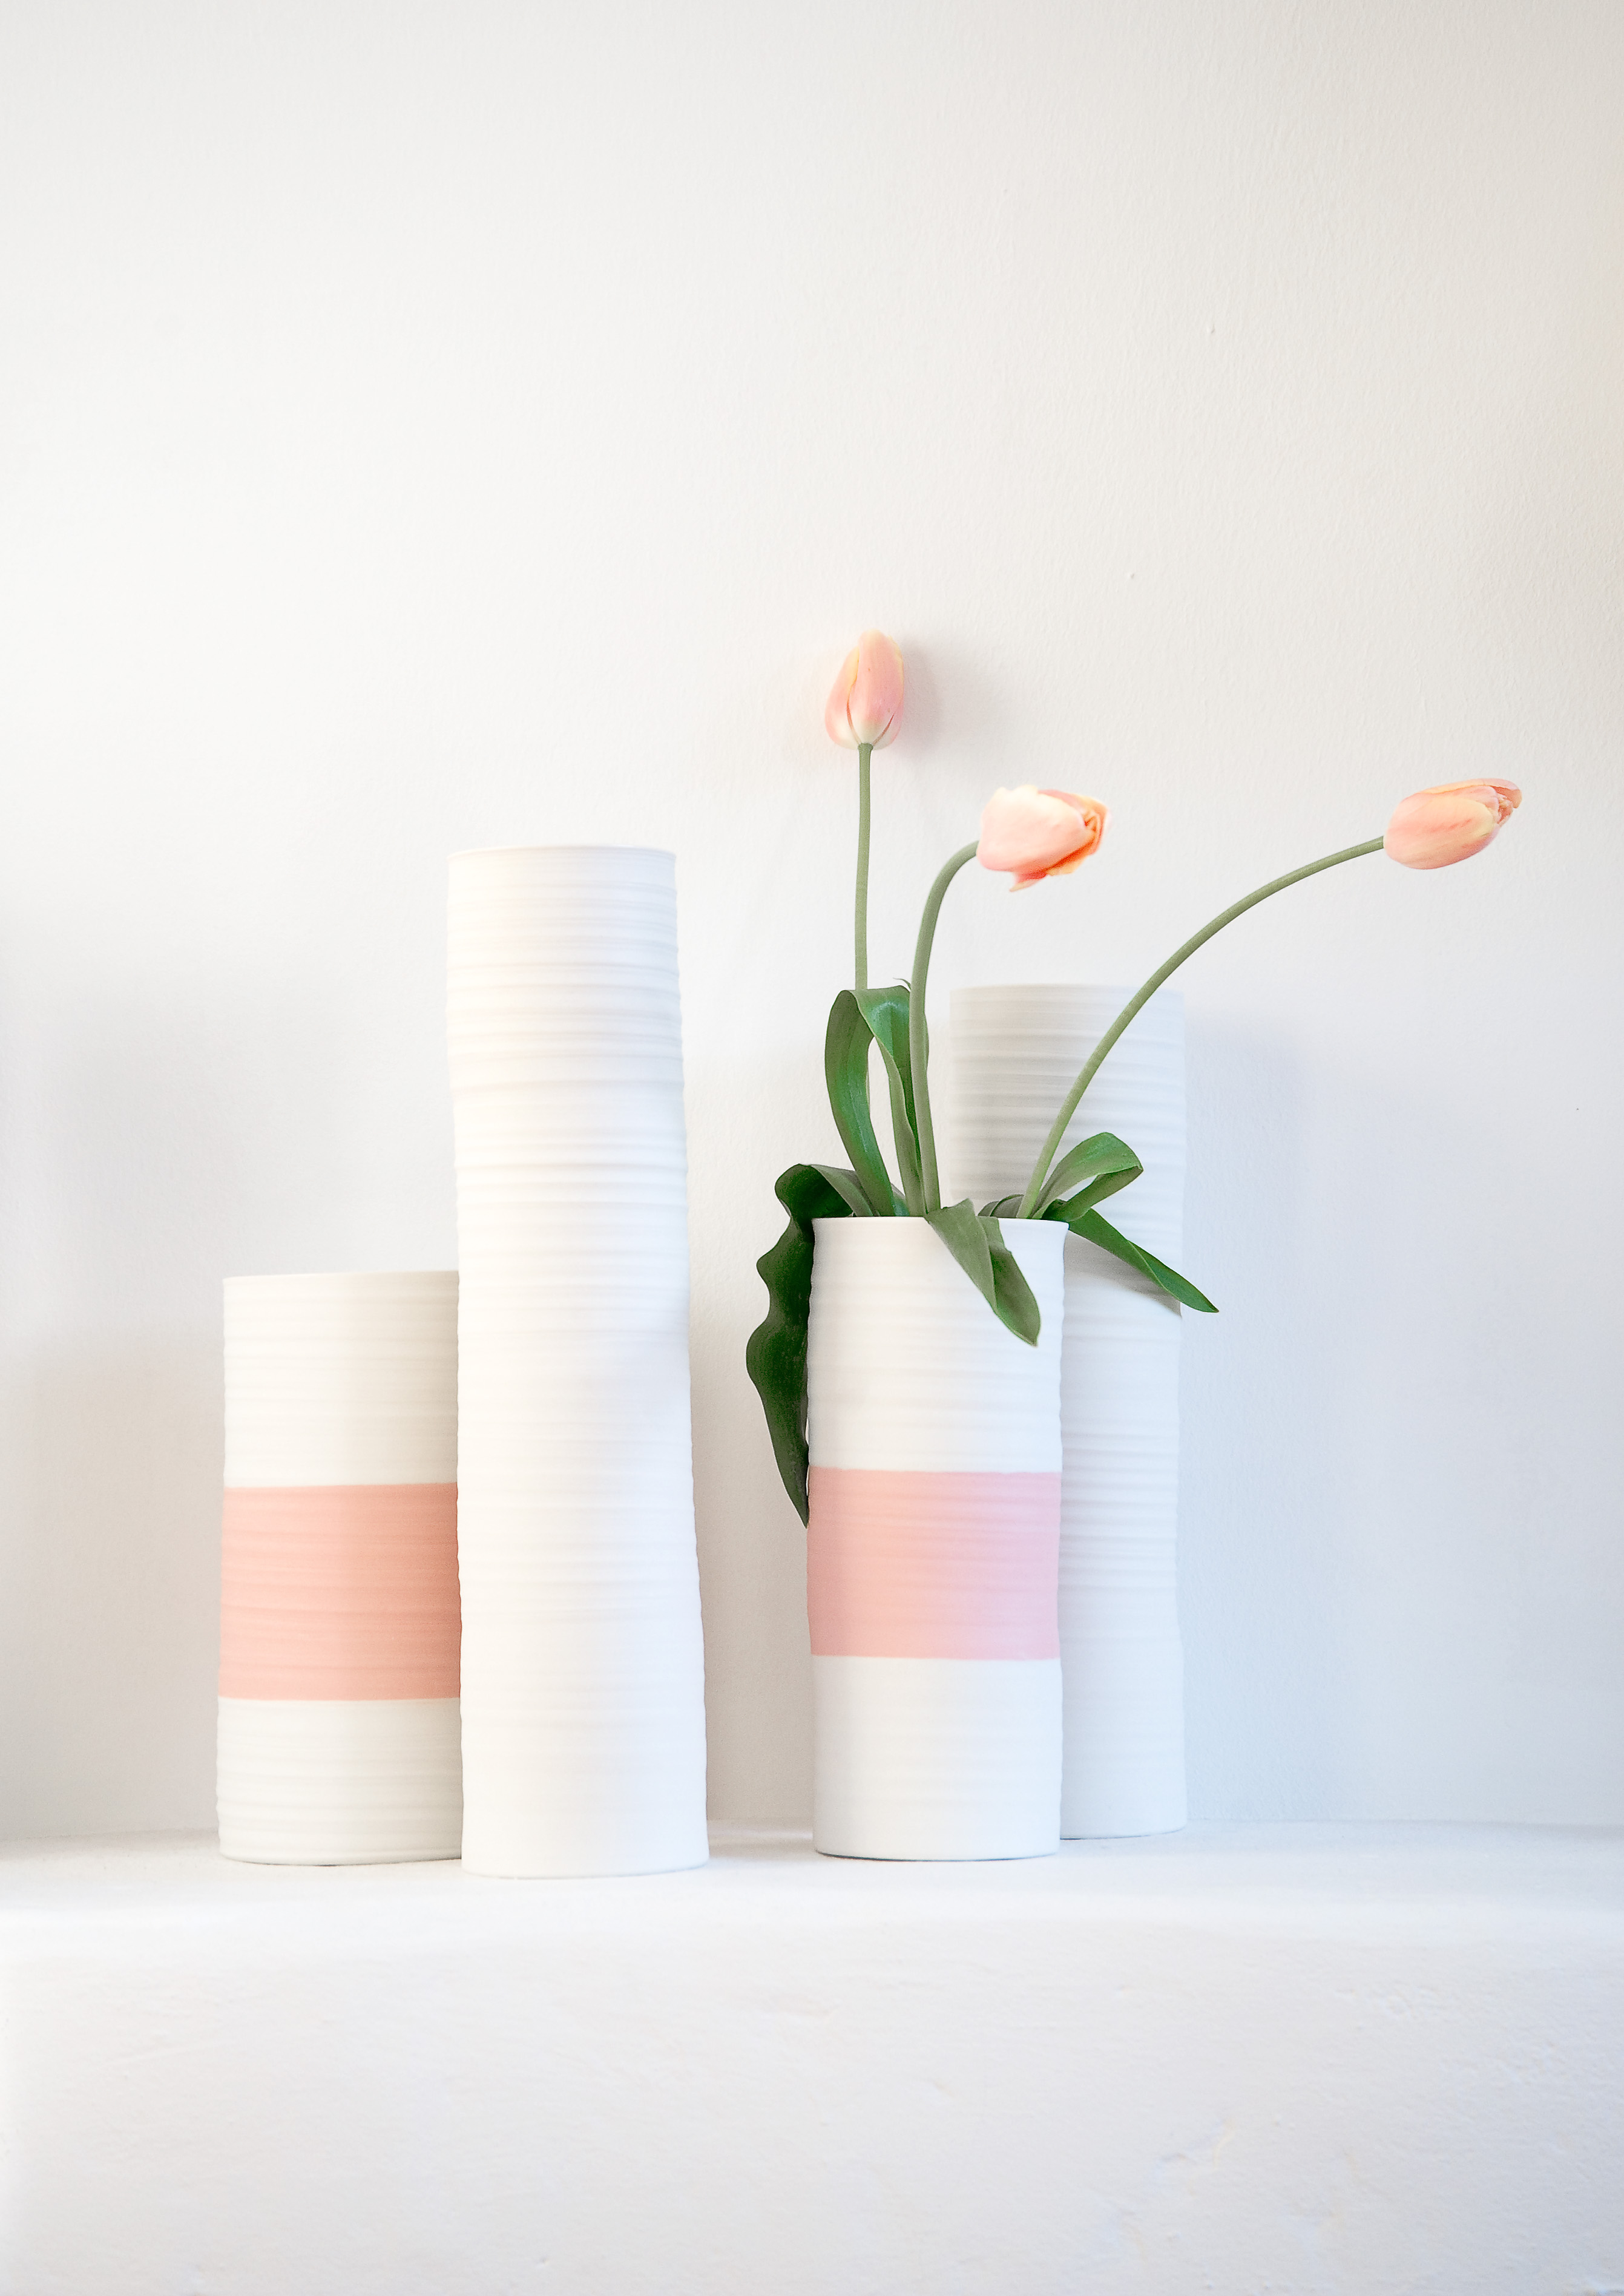 Annika Schüler ceramics